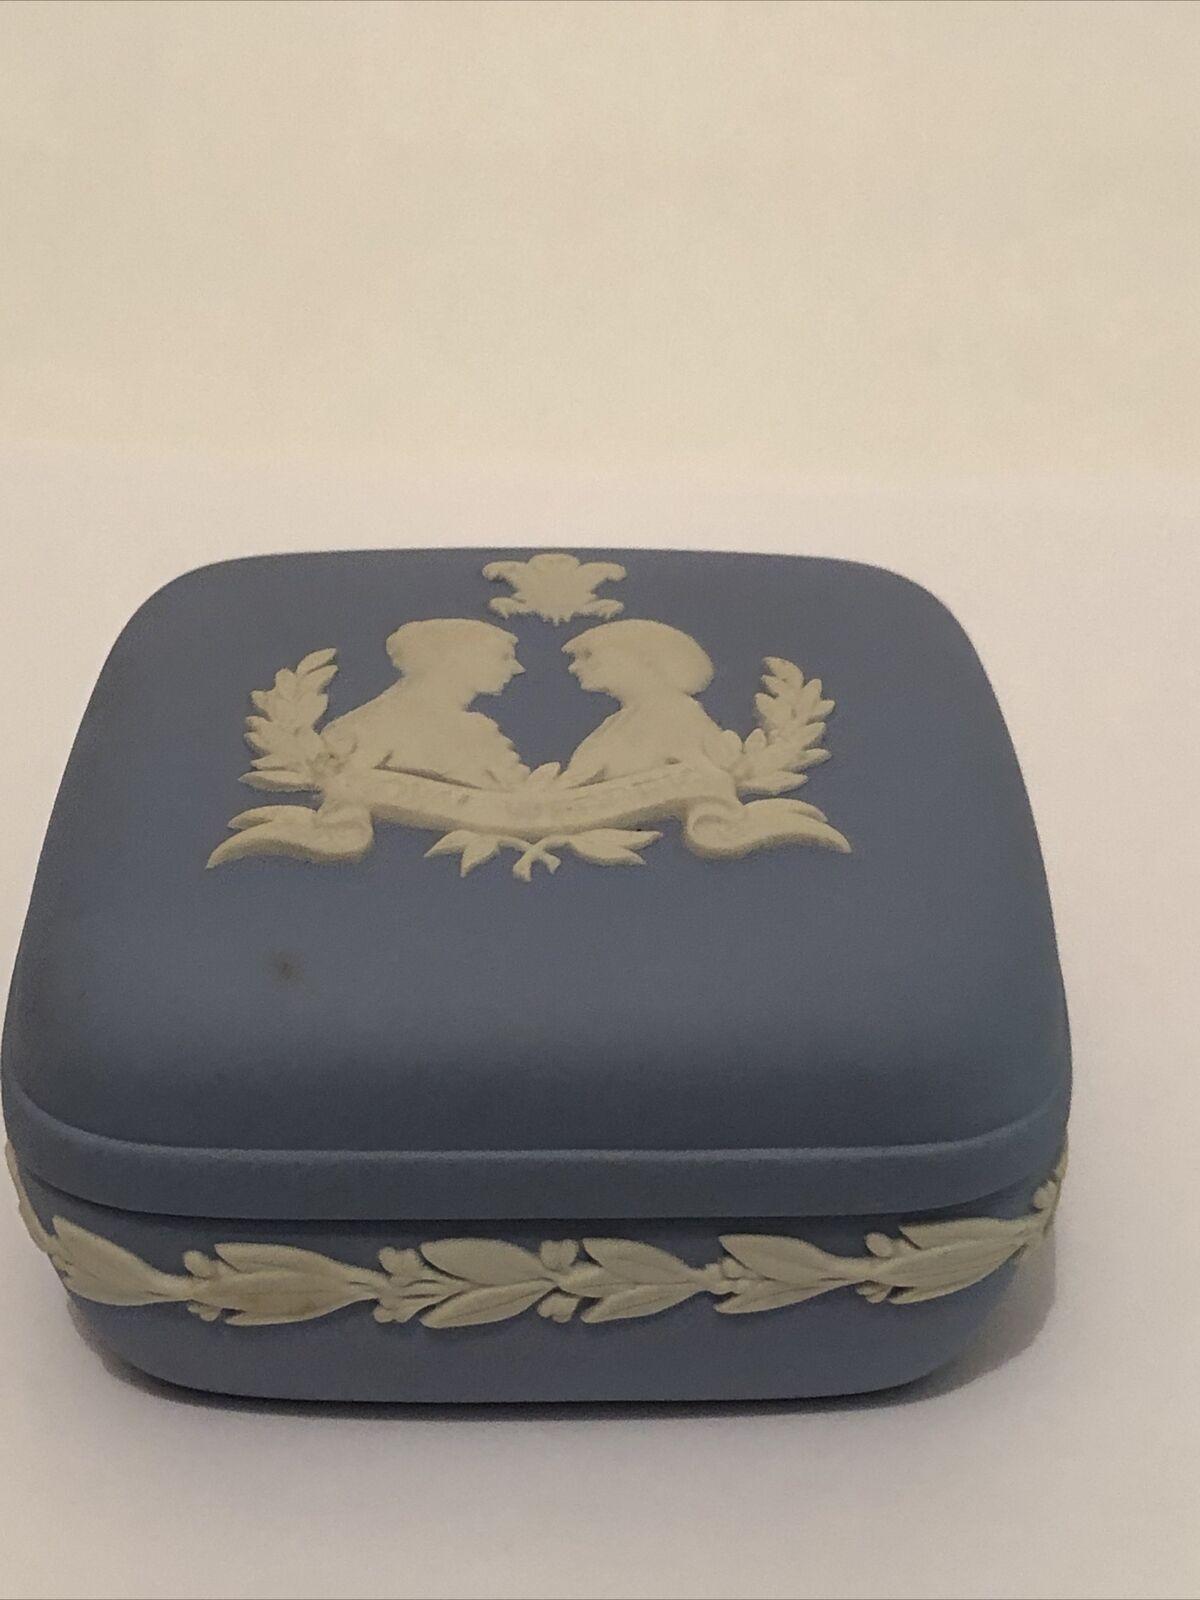 Image 1 - Royal Wedding 1981 - Square Trinket Box - wedgwood jasper ware